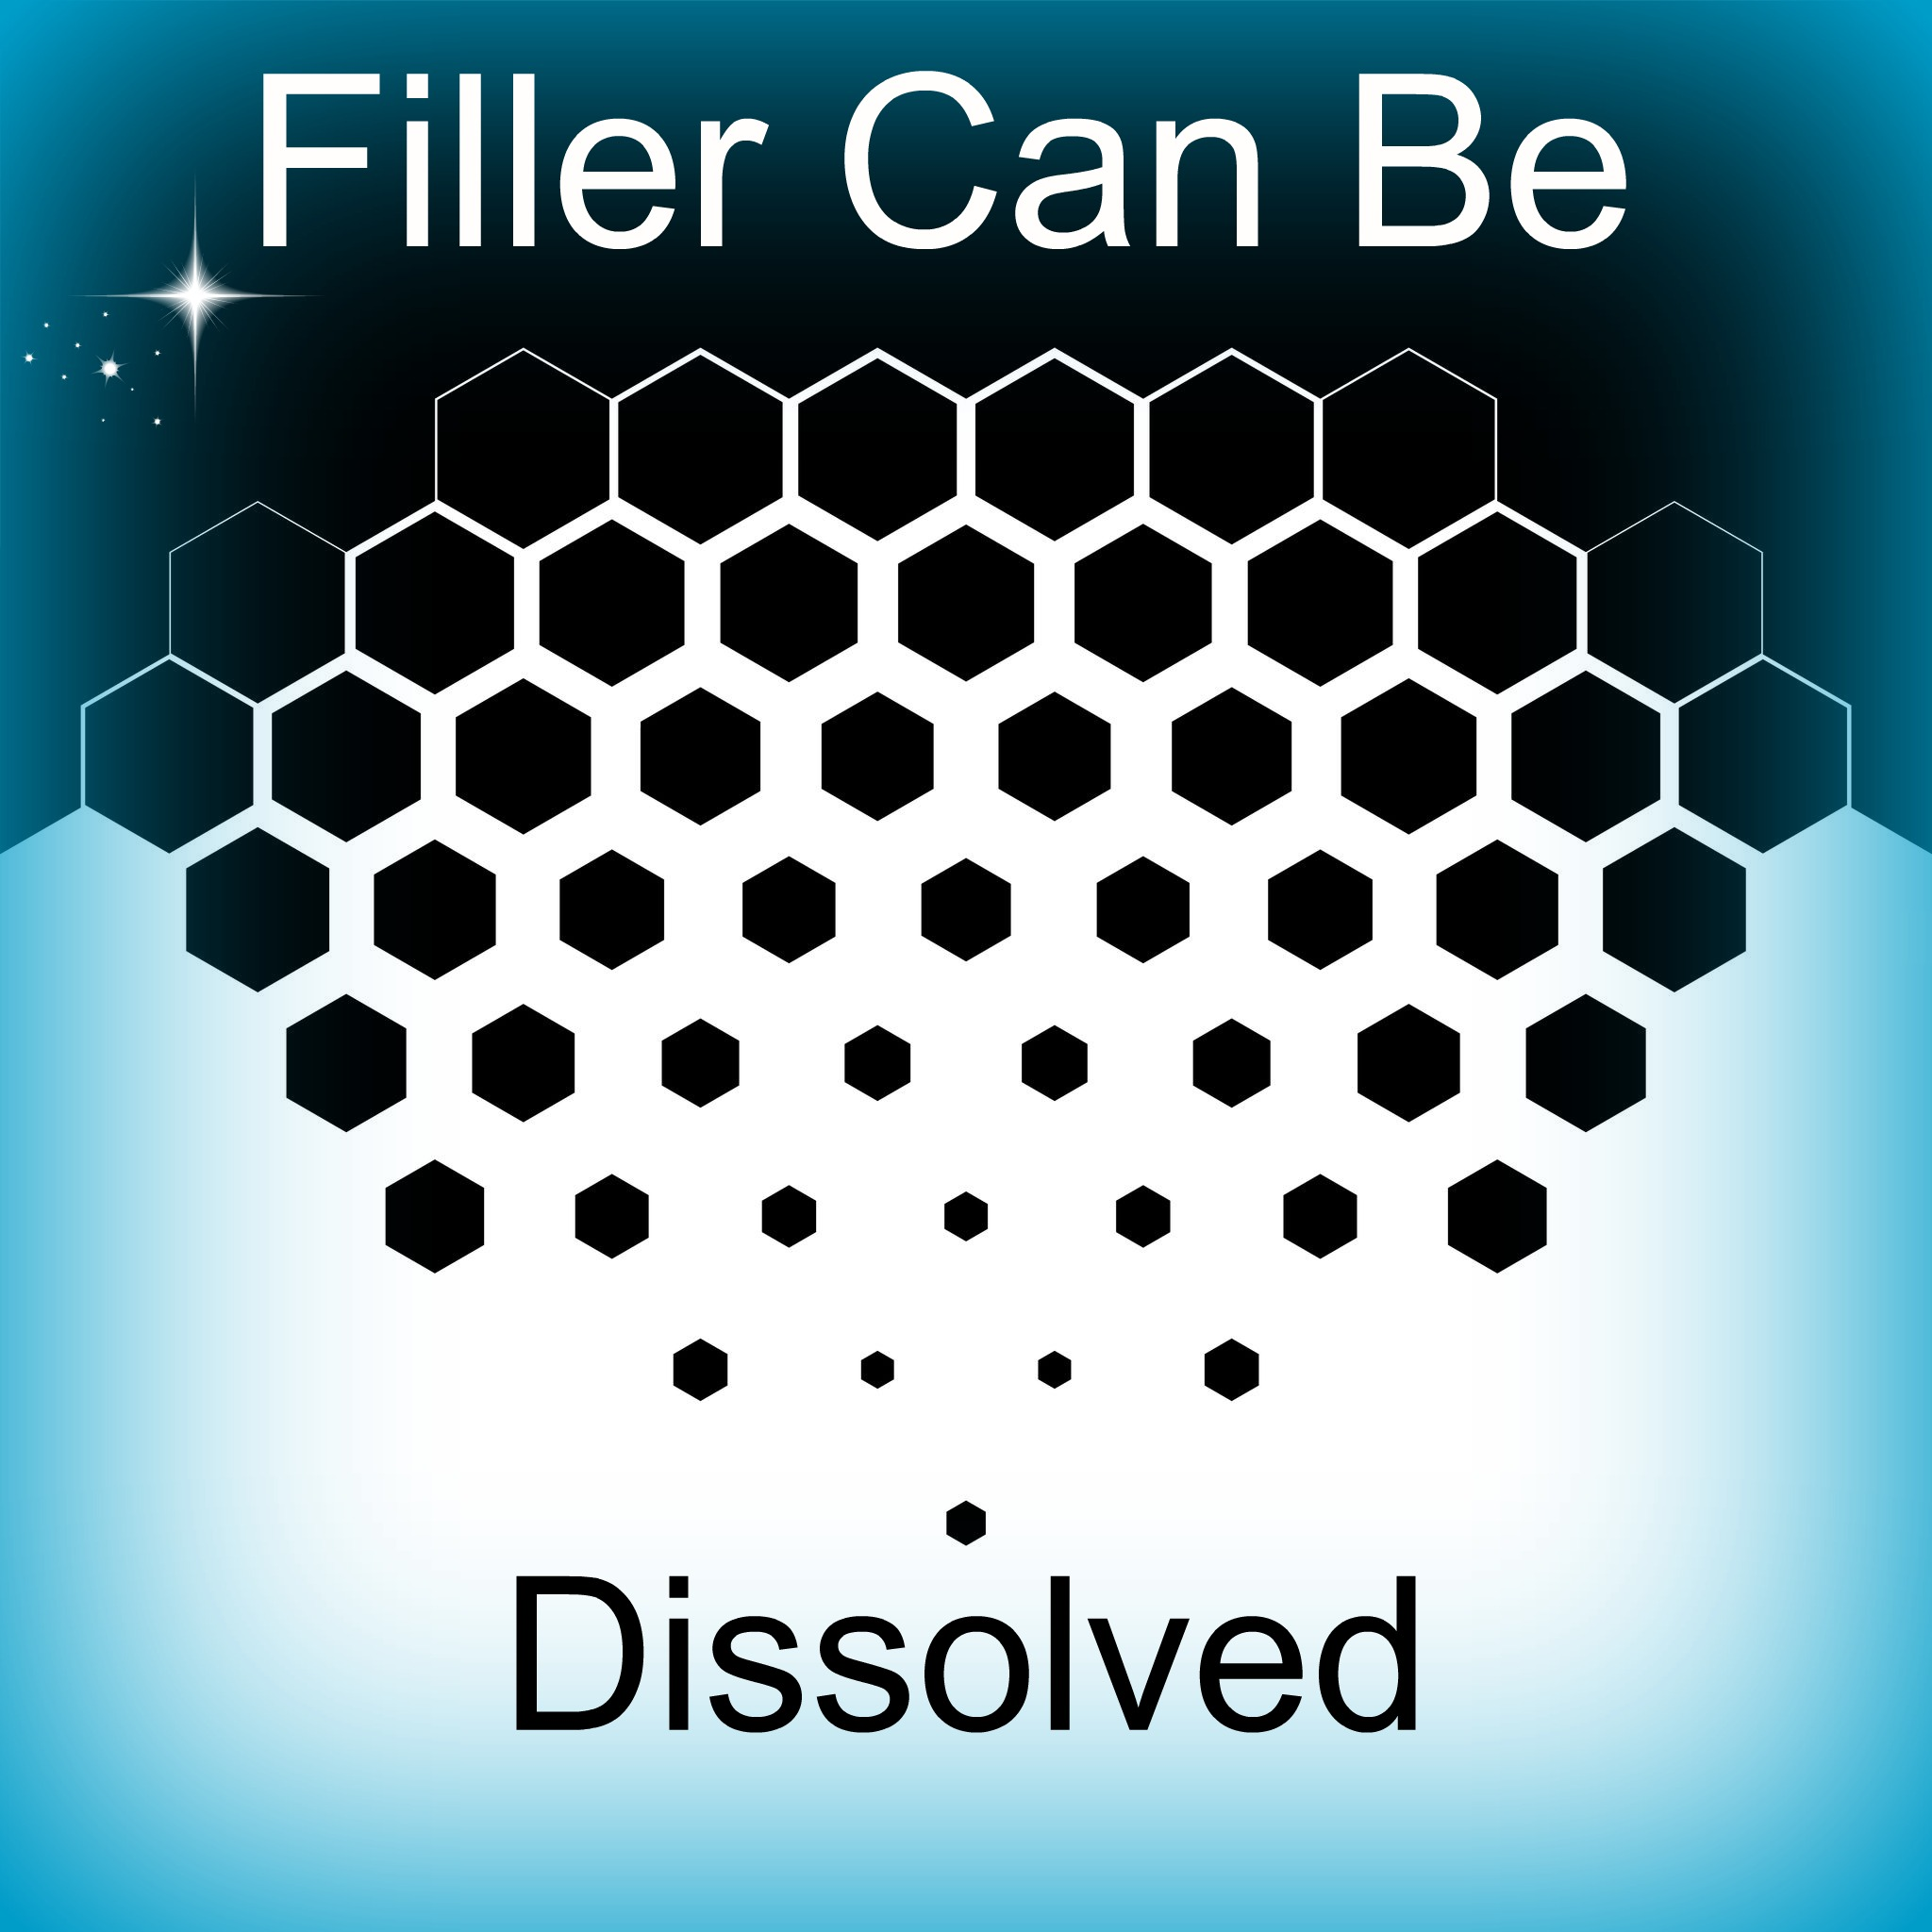 ad filler dissolve